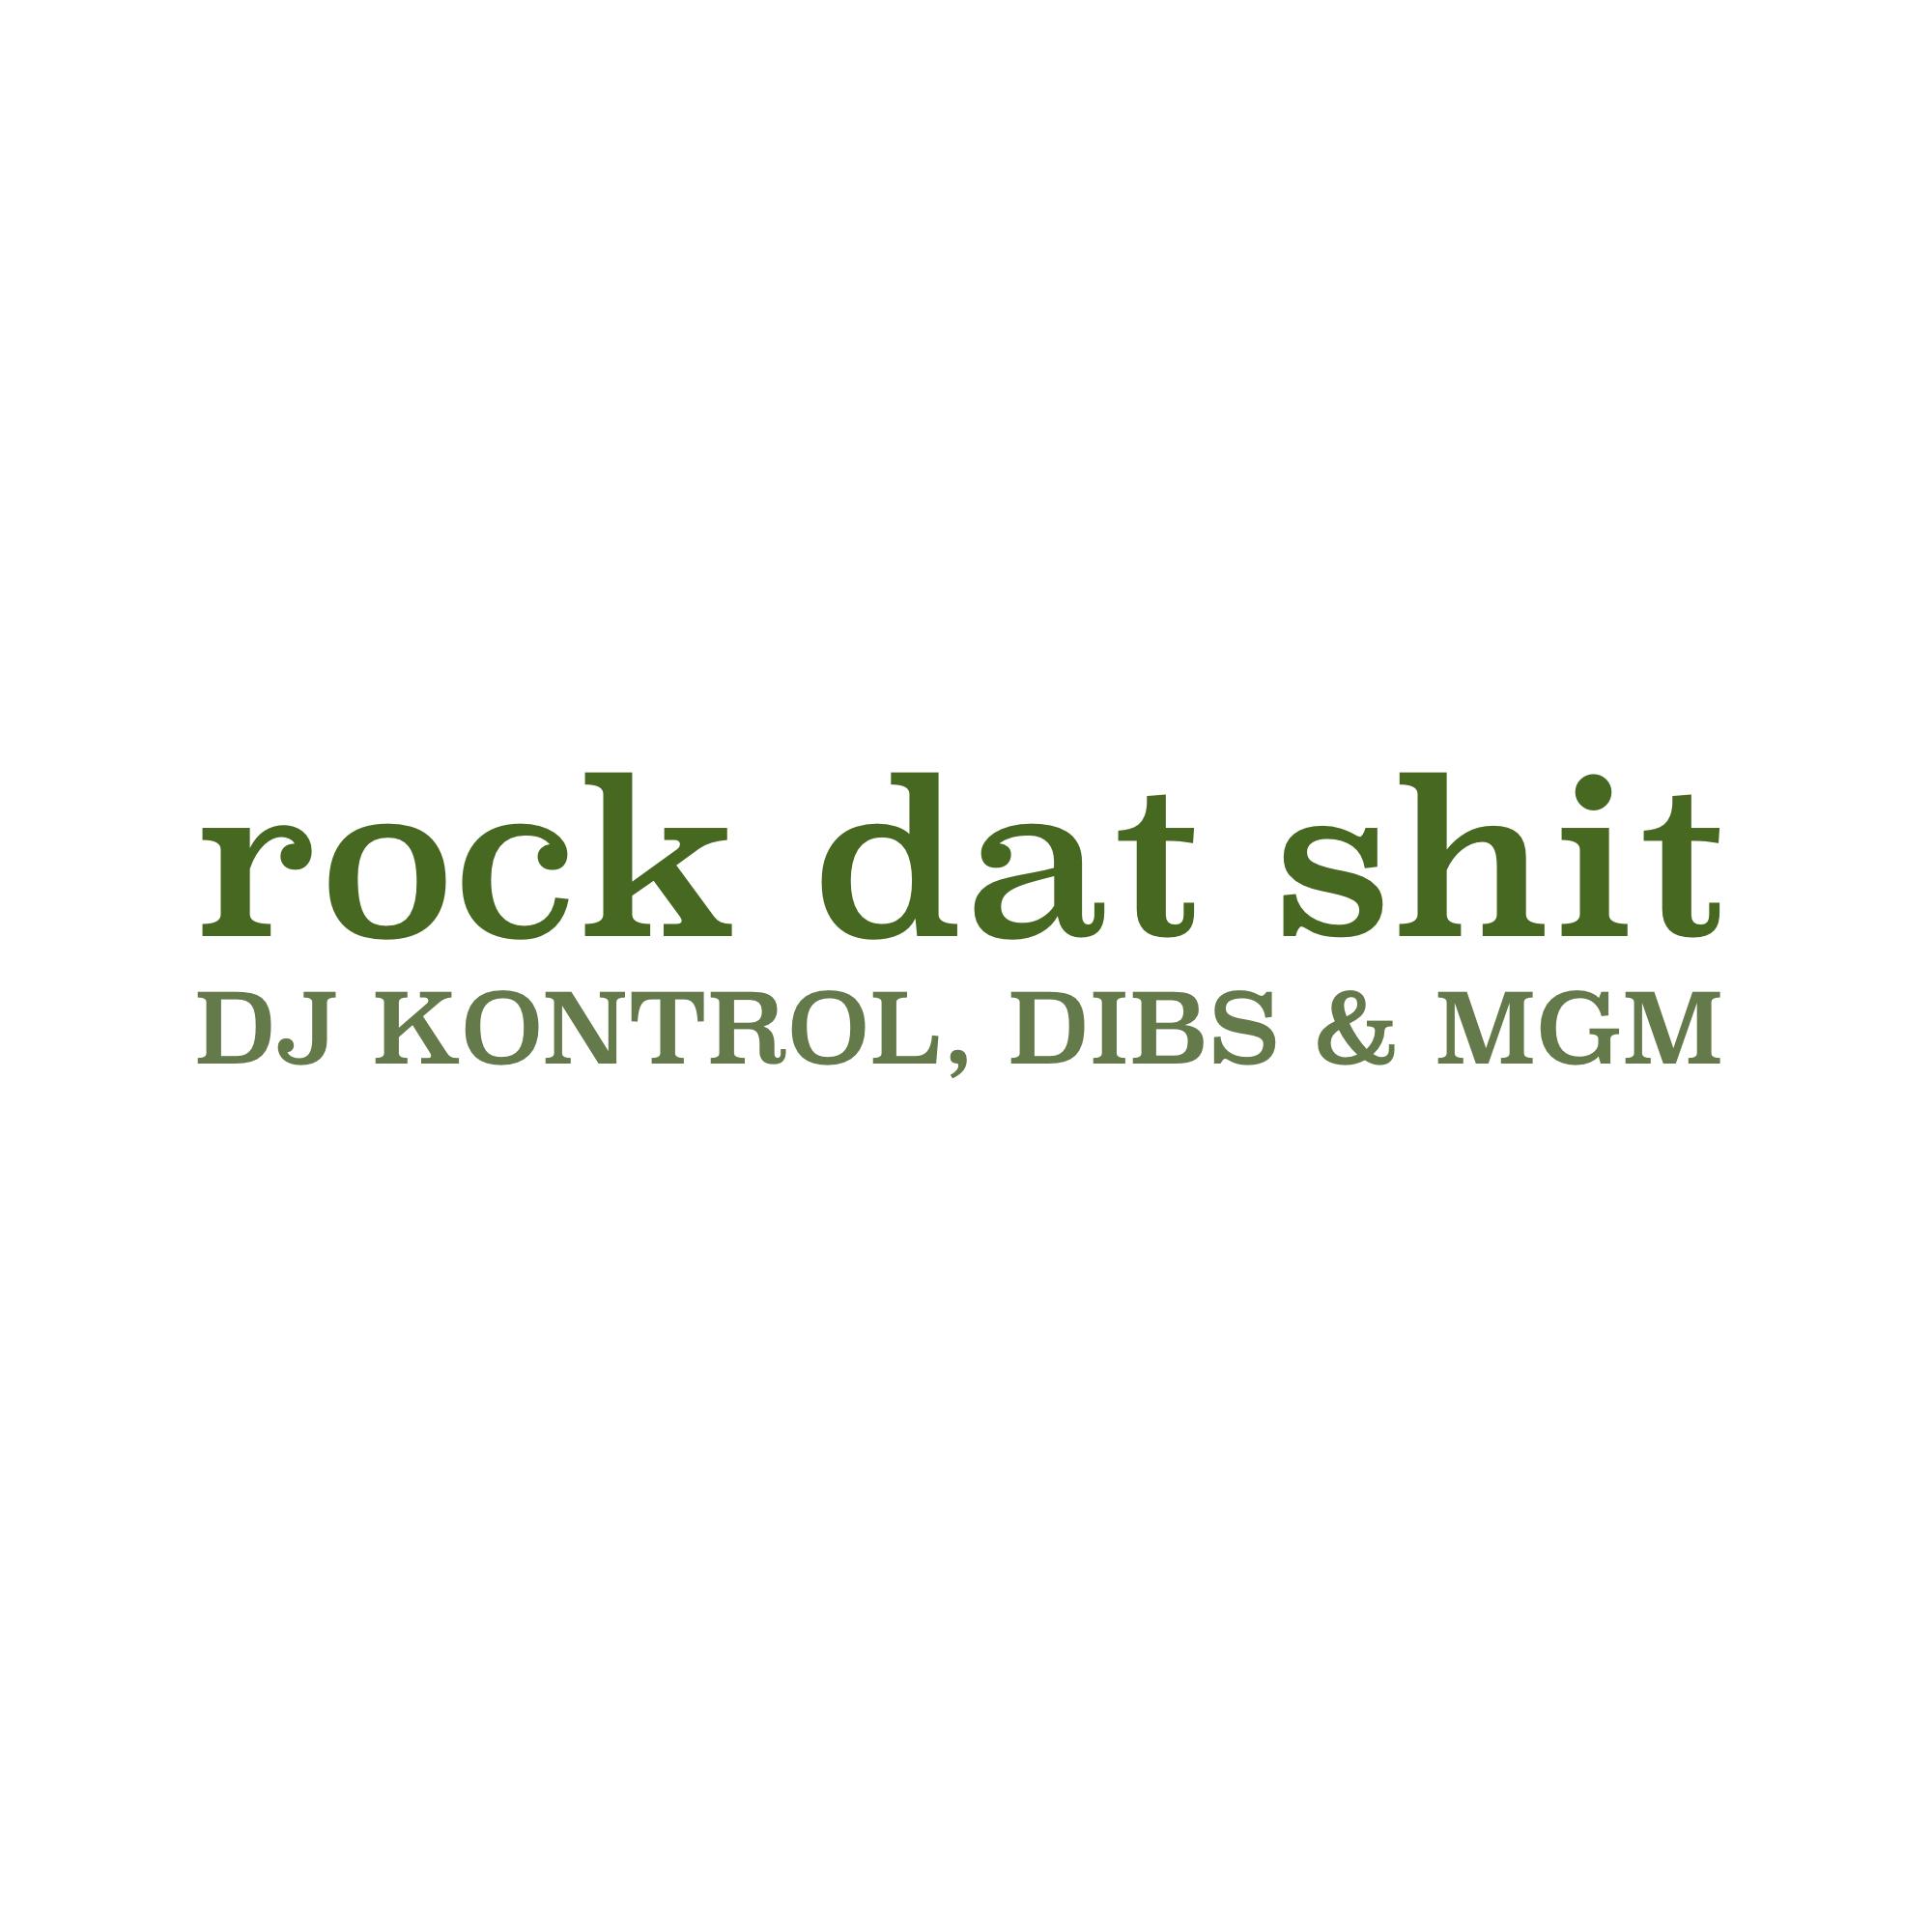 DJ Kontrol, Dibs & MGM - Rock Dat Shit